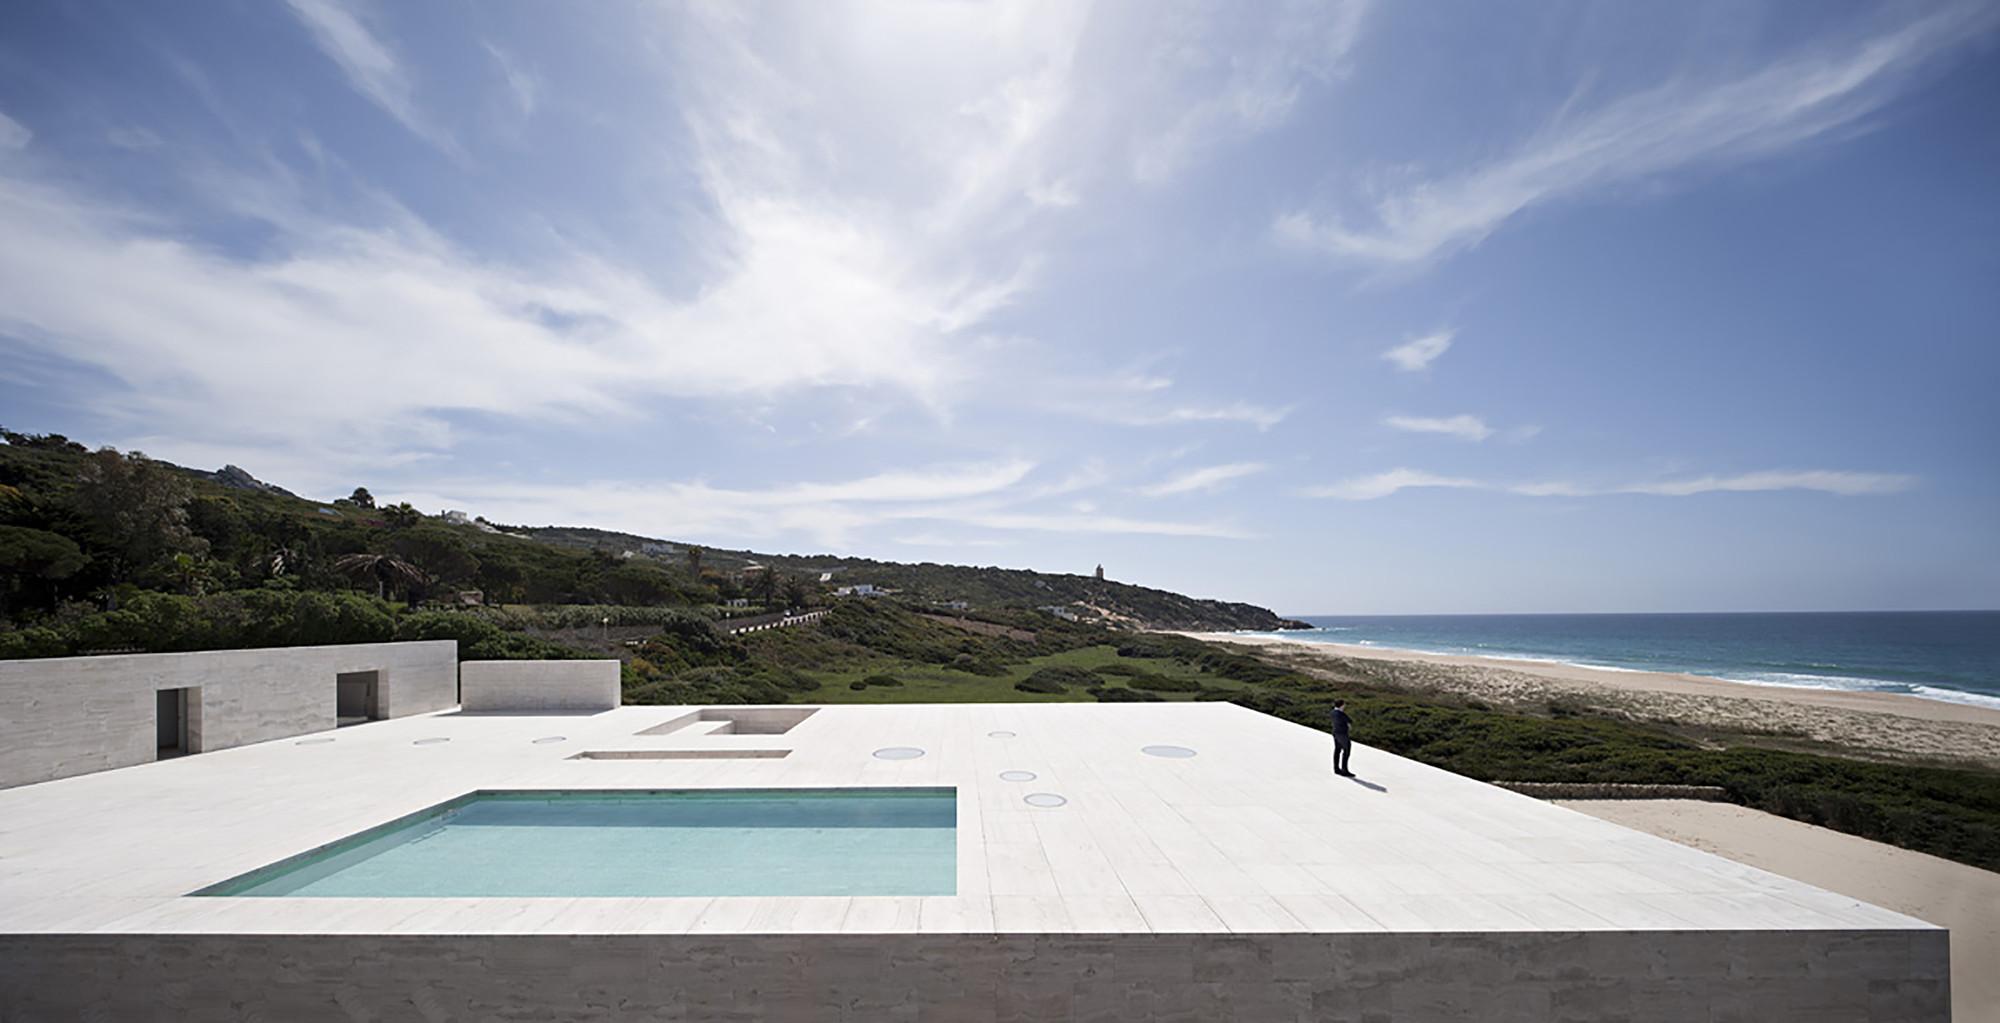 house of the infinite alberto campo baeza casalibrary. Black Bedroom Furniture Sets. Home Design Ideas